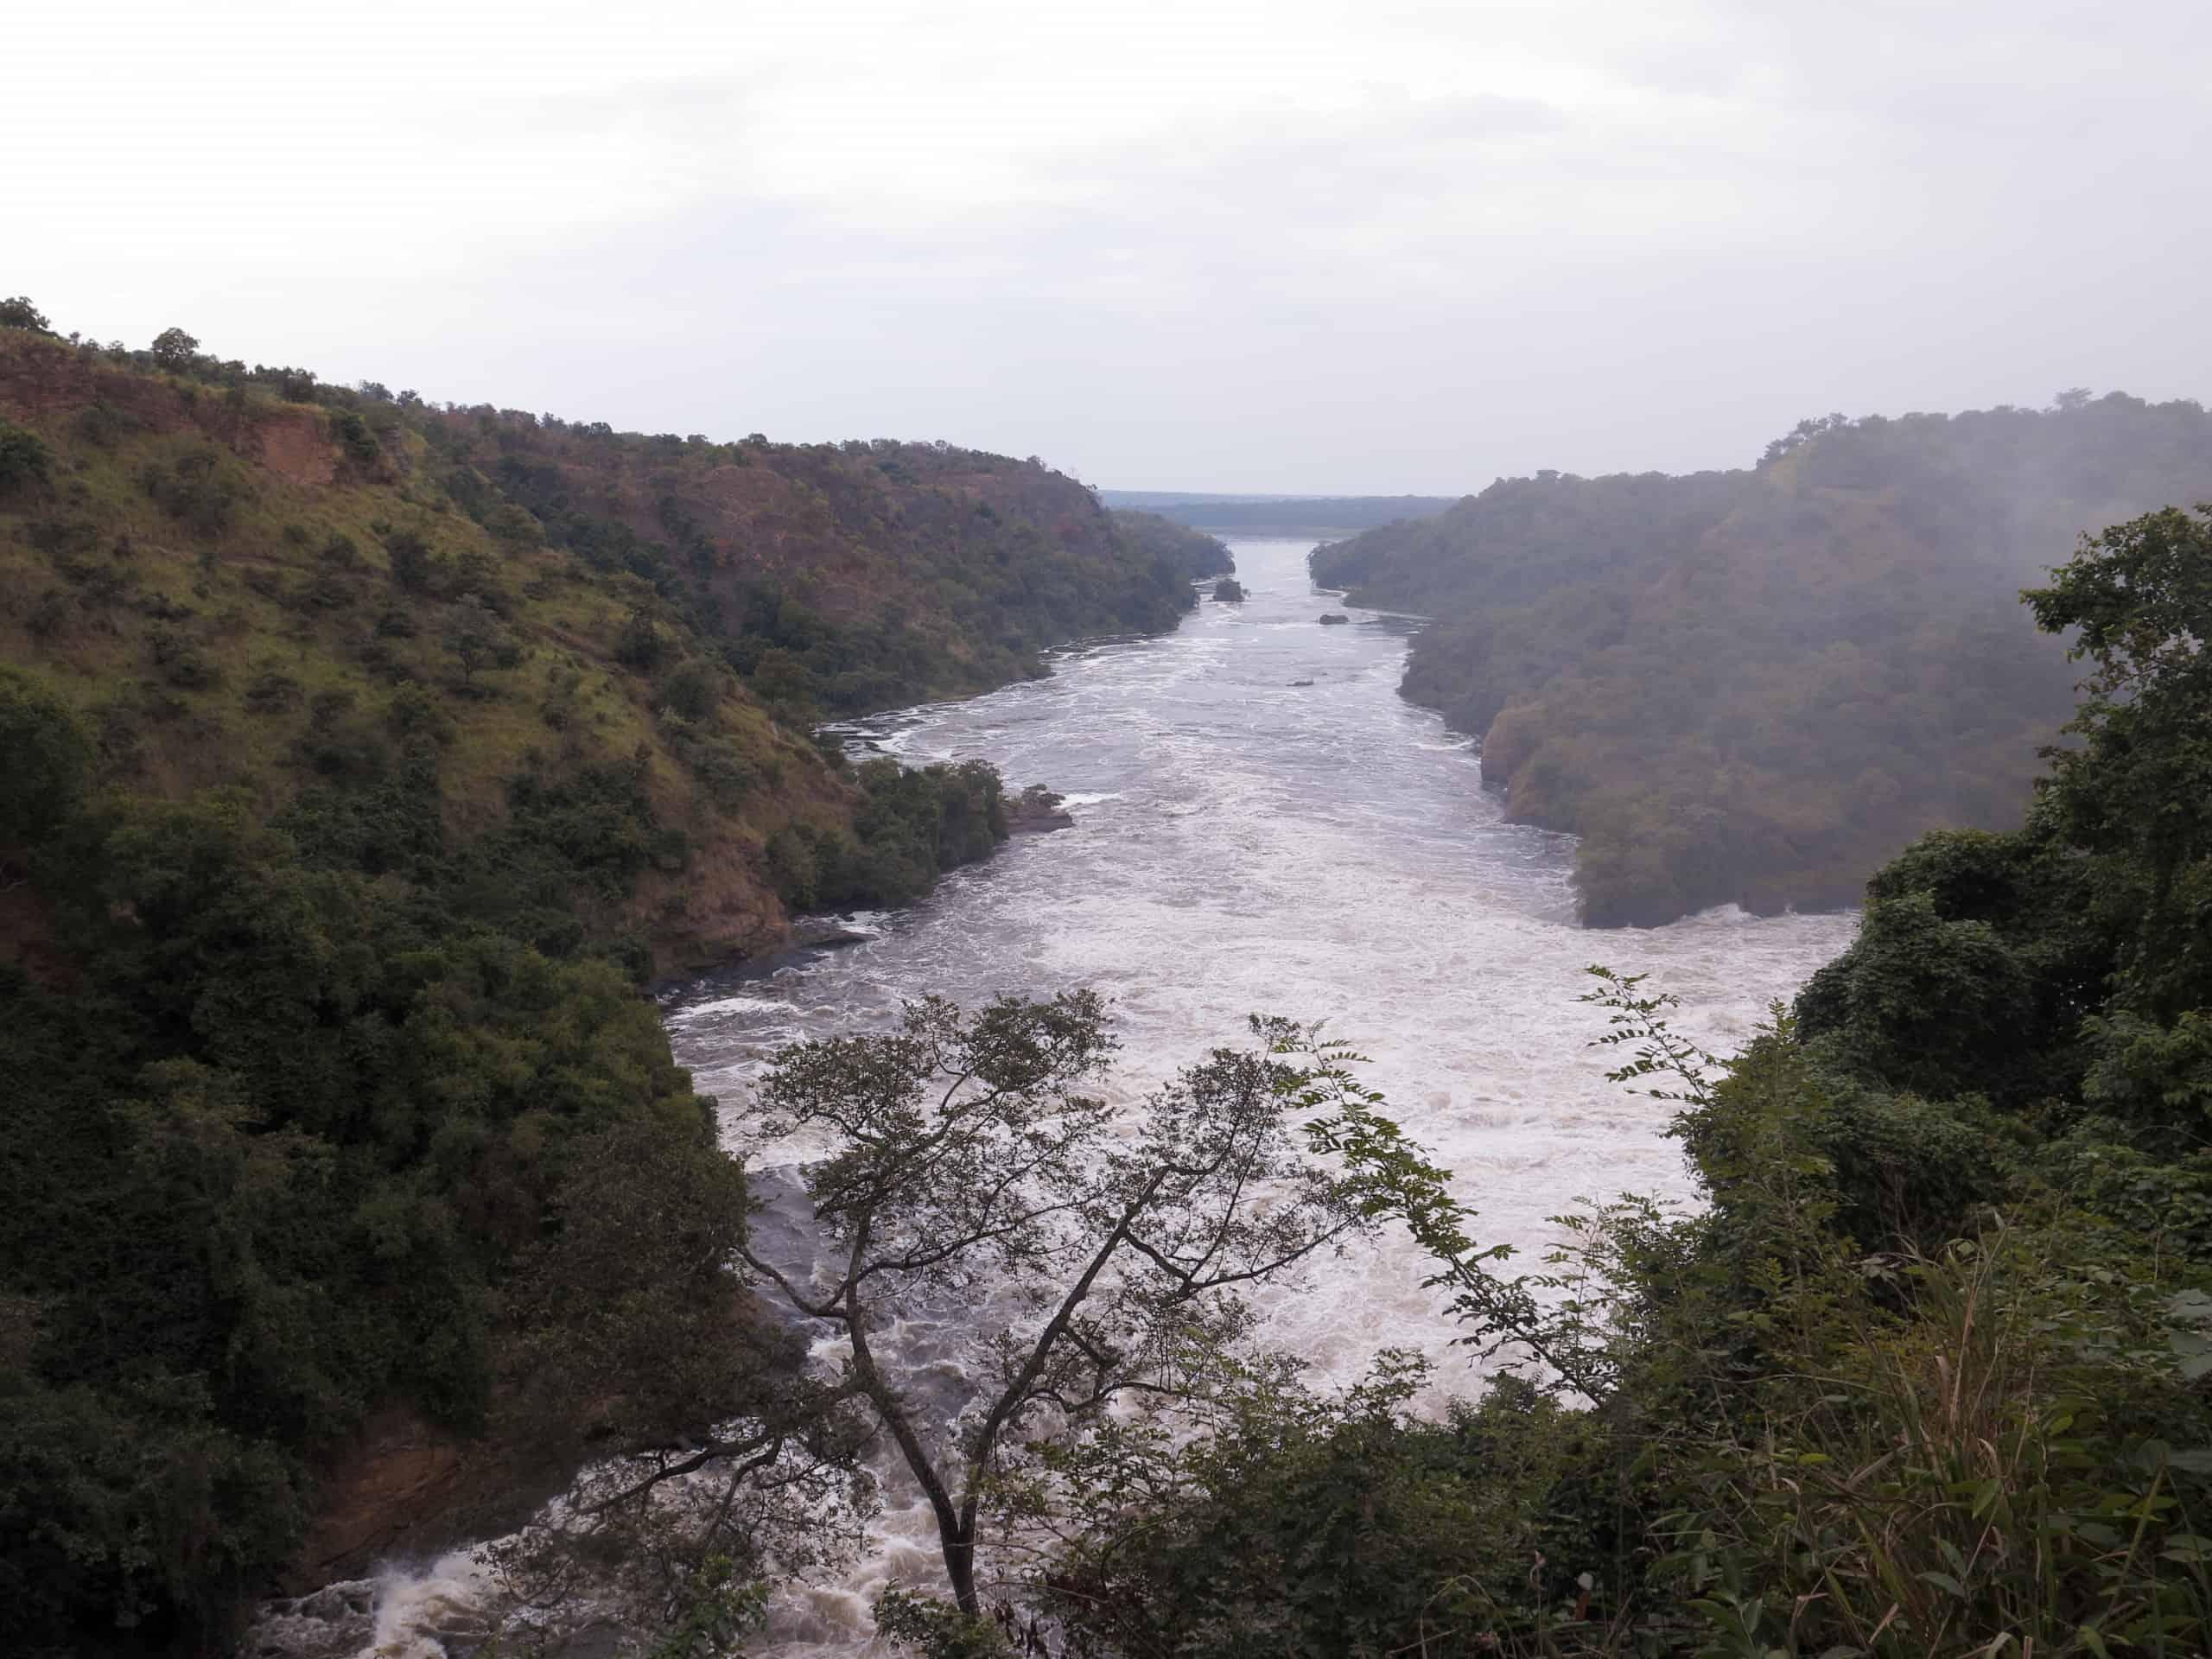 Top of the Falls, Murchinson Falls National Park, Uganda, August 2018